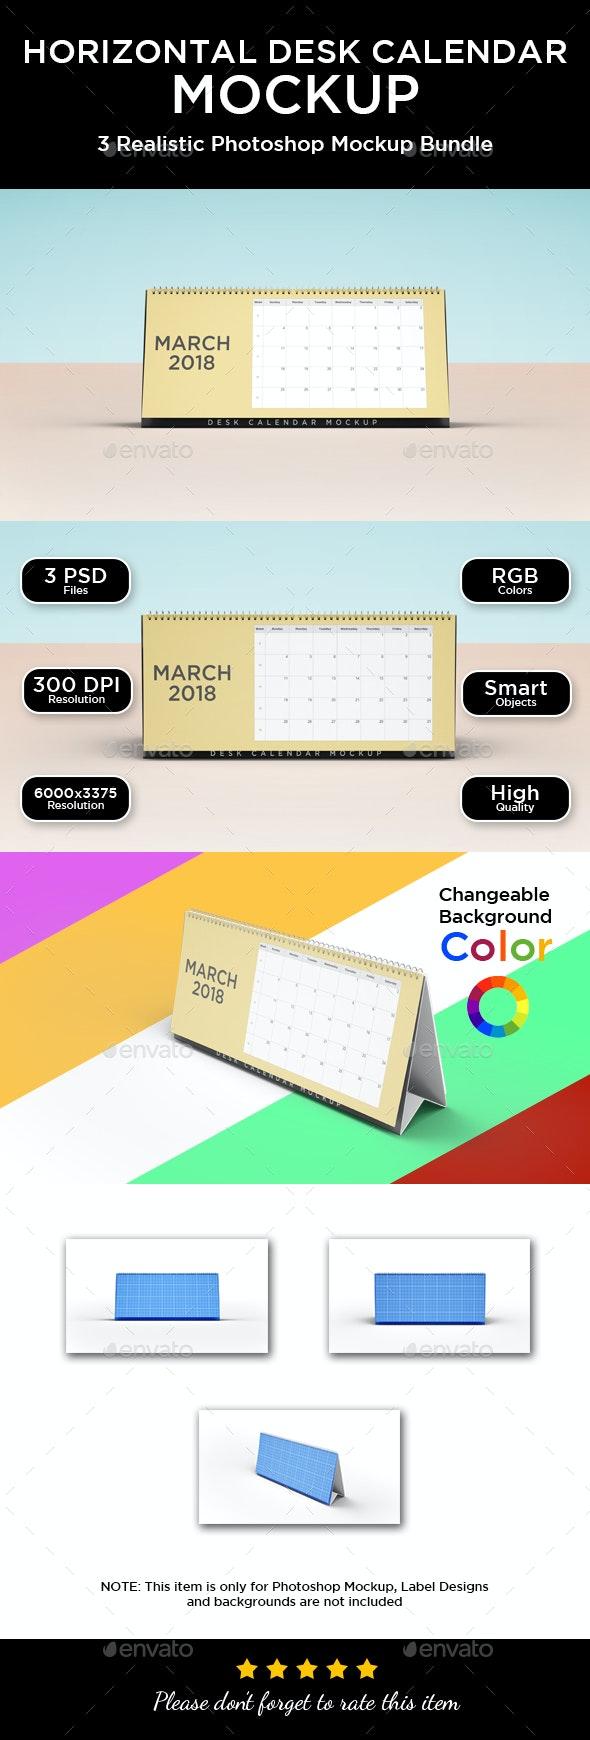 Horizontal Desk Calendar Mockup - Print Product Mock-Ups